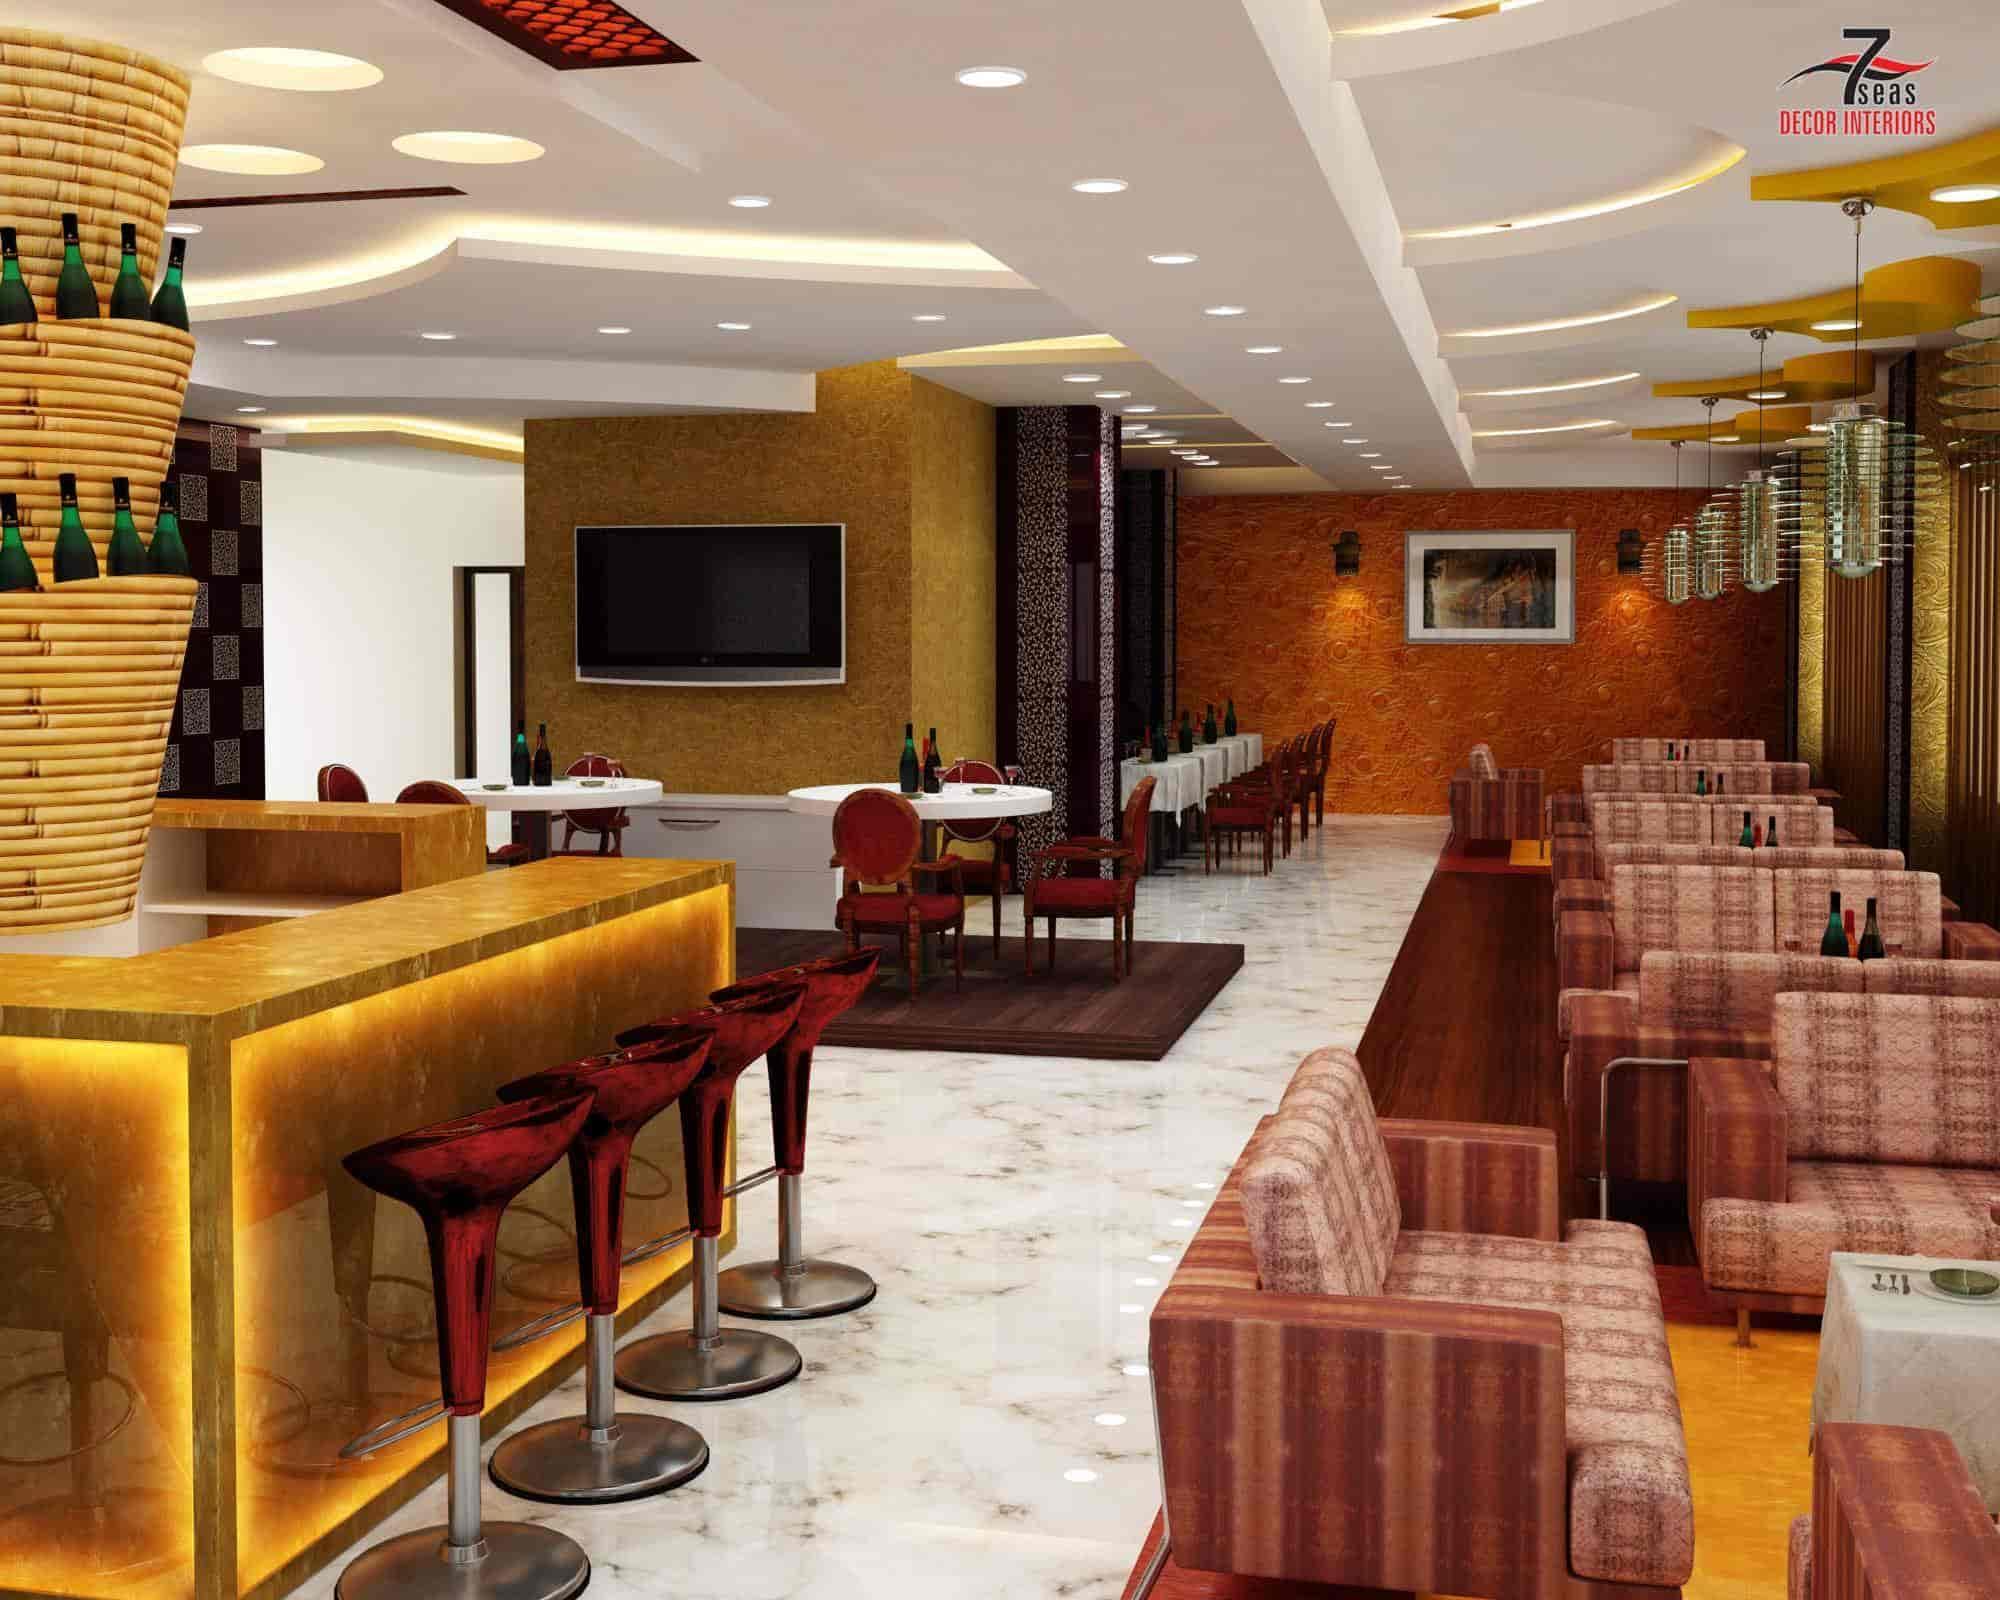 7 Seas Decor Interiors, Pitampura   Interior Decorators In Delhi   Justdial